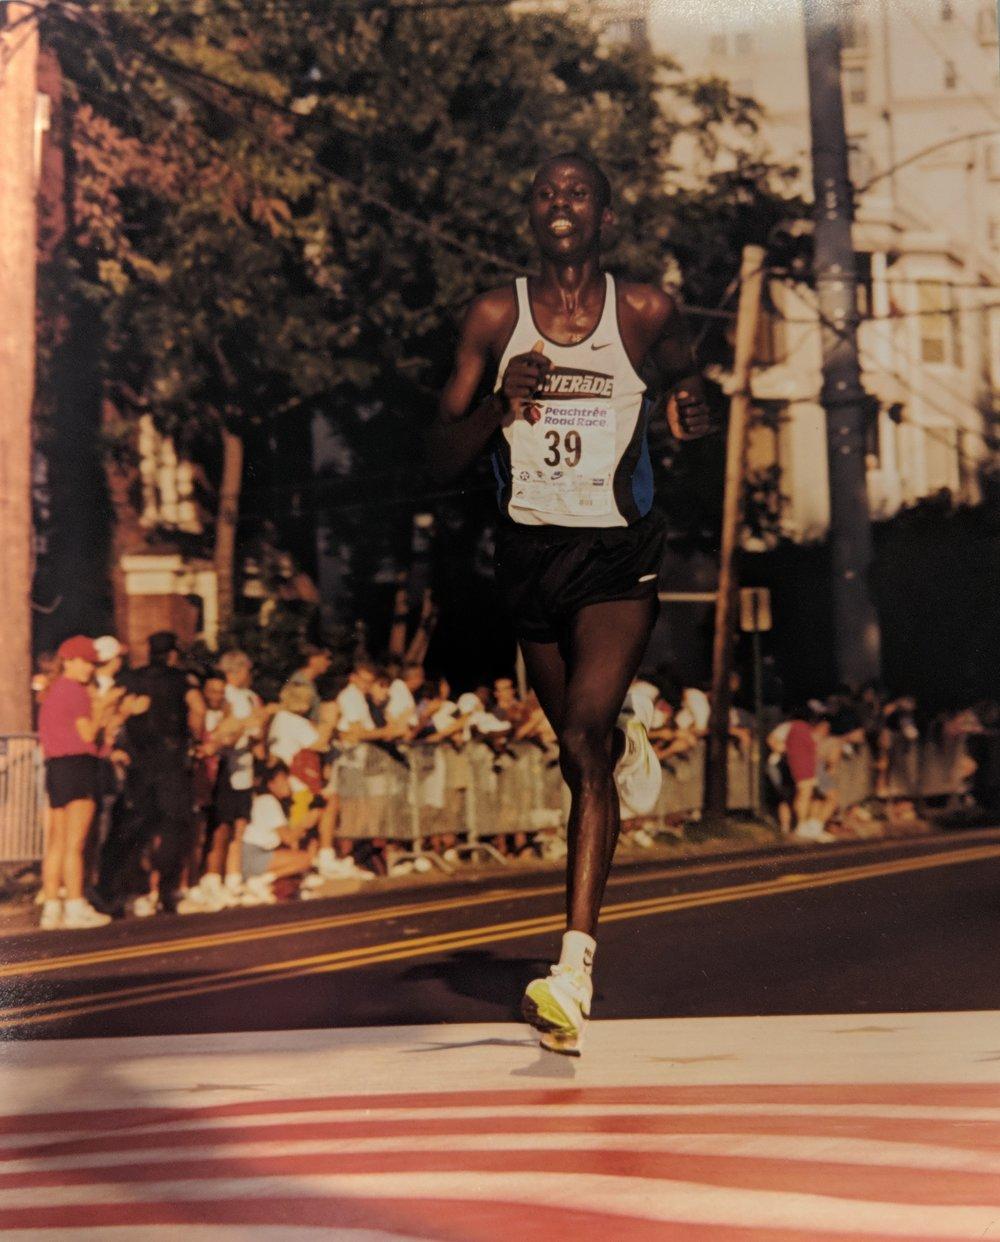 Joseph Kimani's record-breaking win